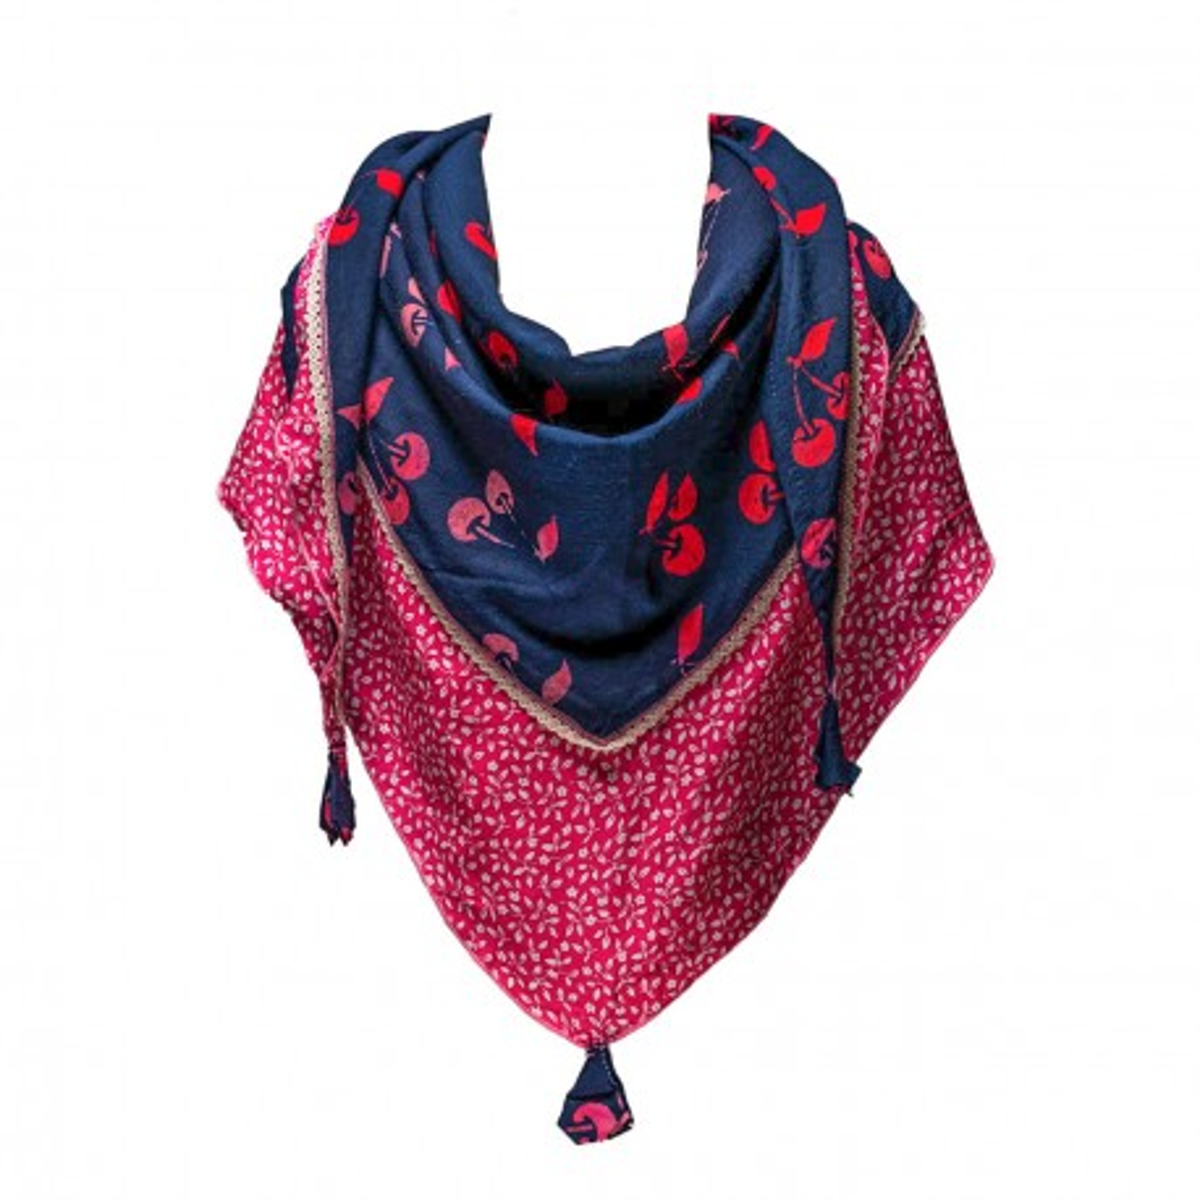 Foulard triangle fille coton rose et bleu